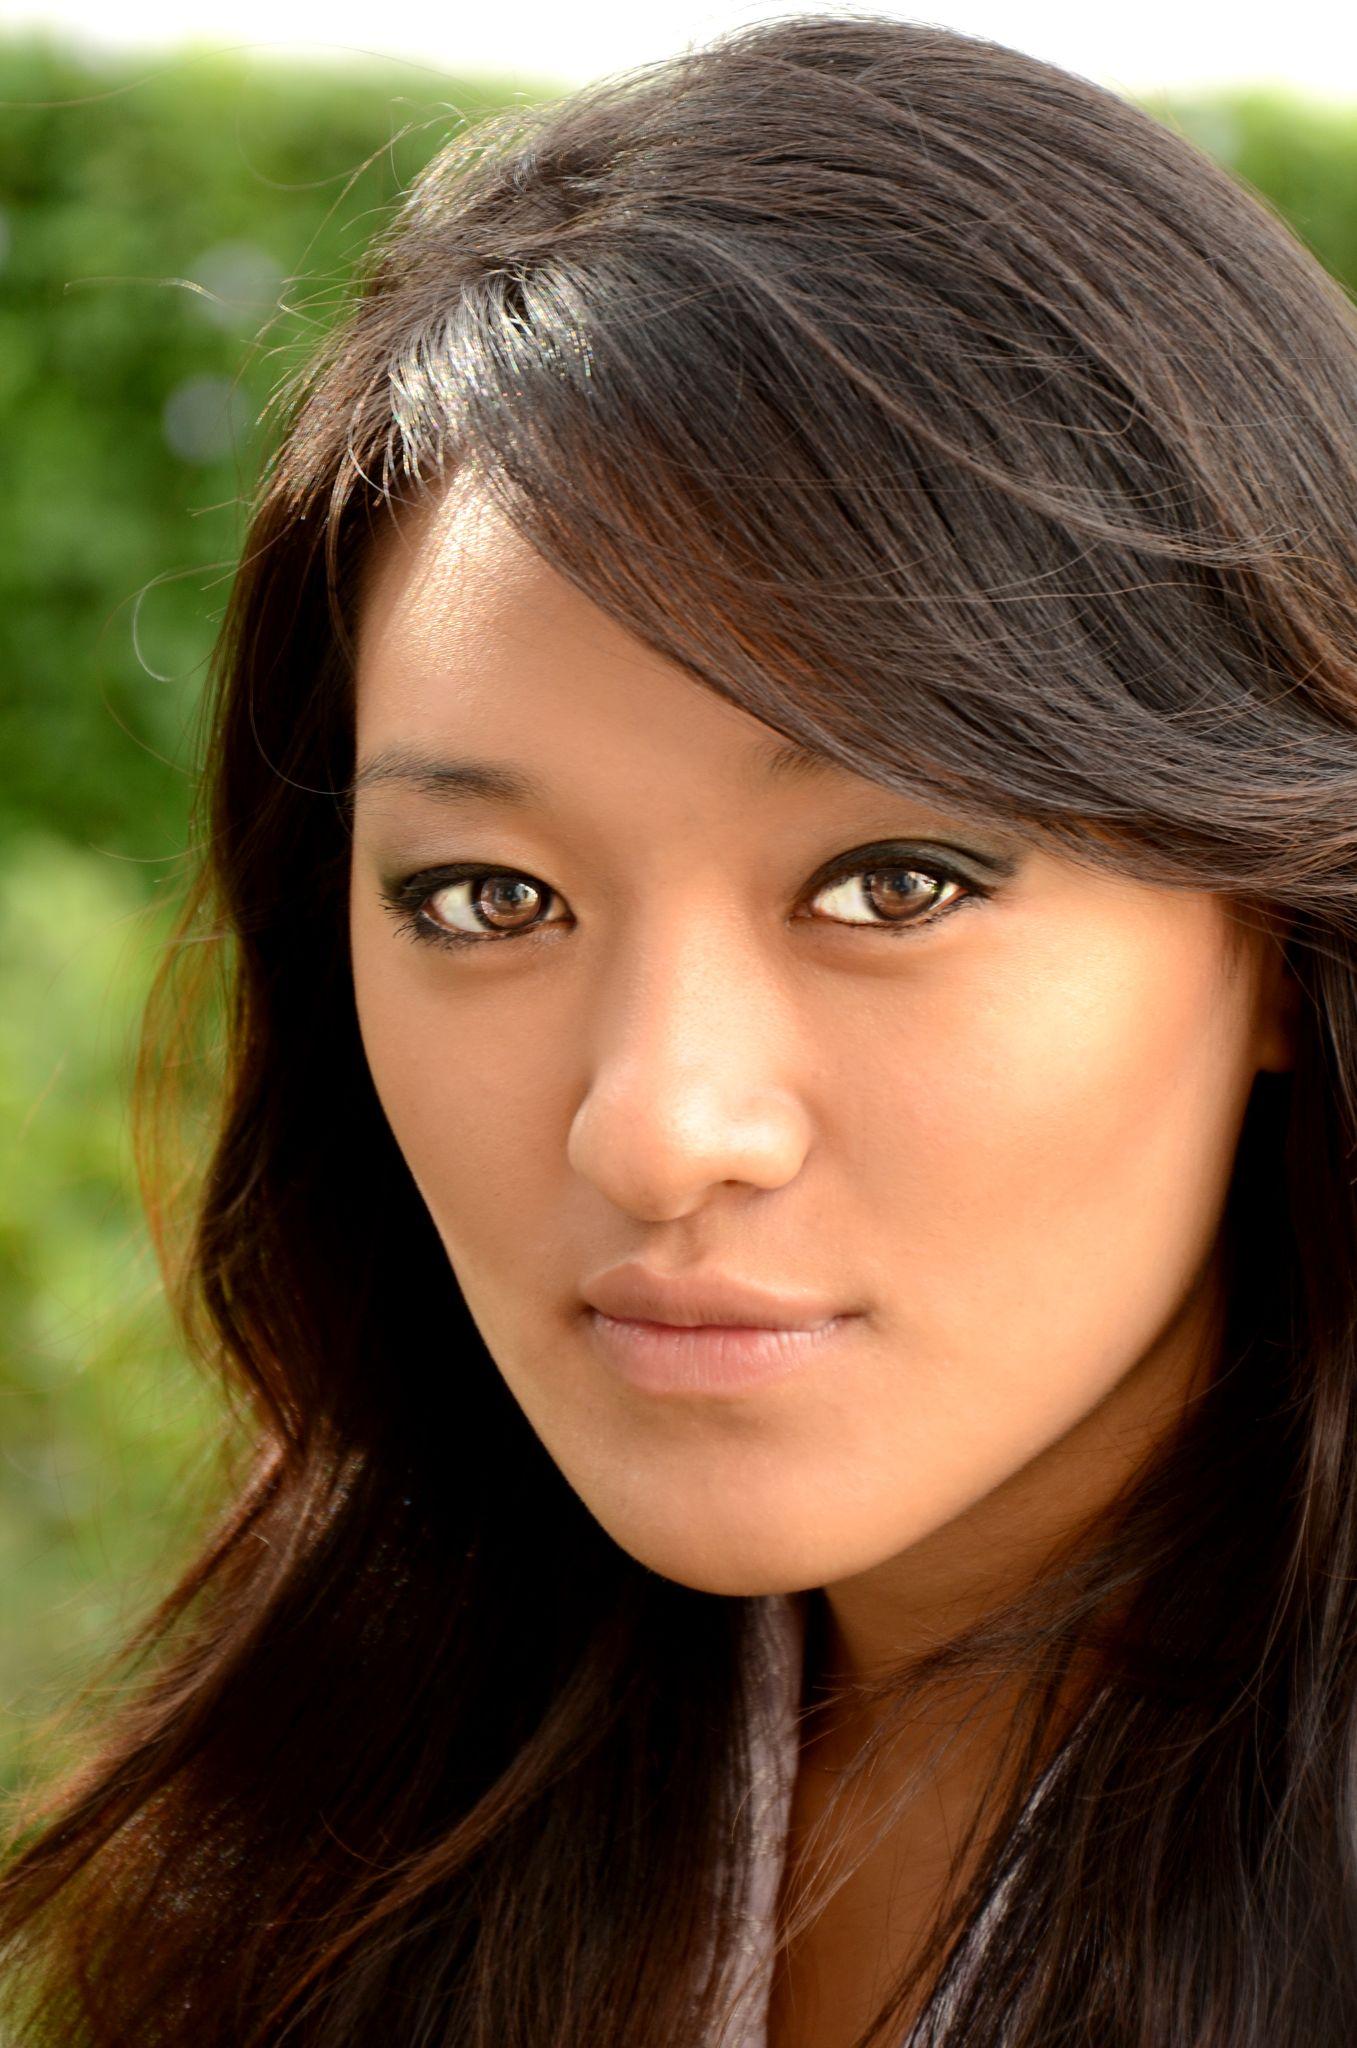 Bhutanese lady by Ugyen Tshering